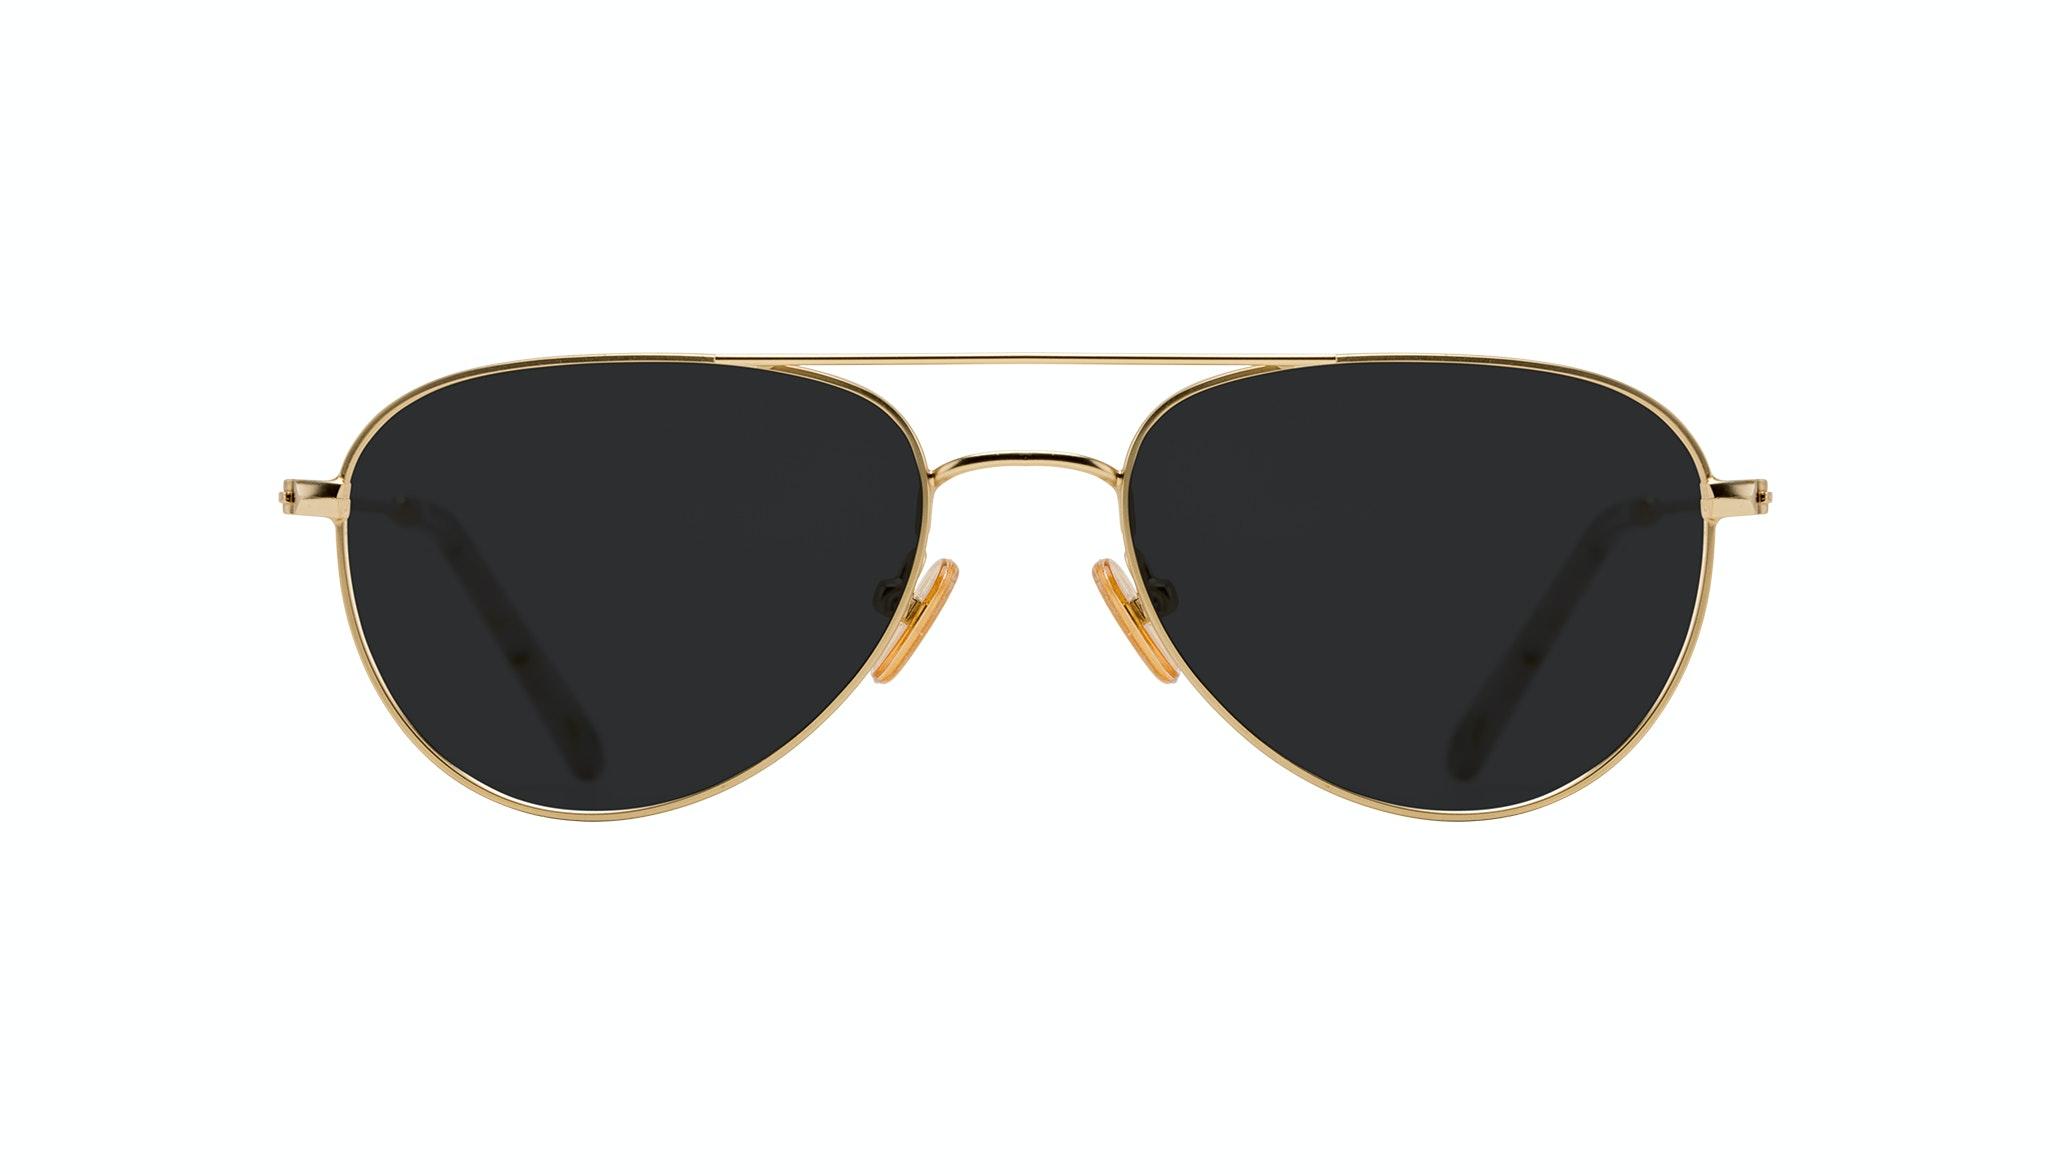 Affordable Fashion Glasses Aviator Sunglasses Women Figure Gold